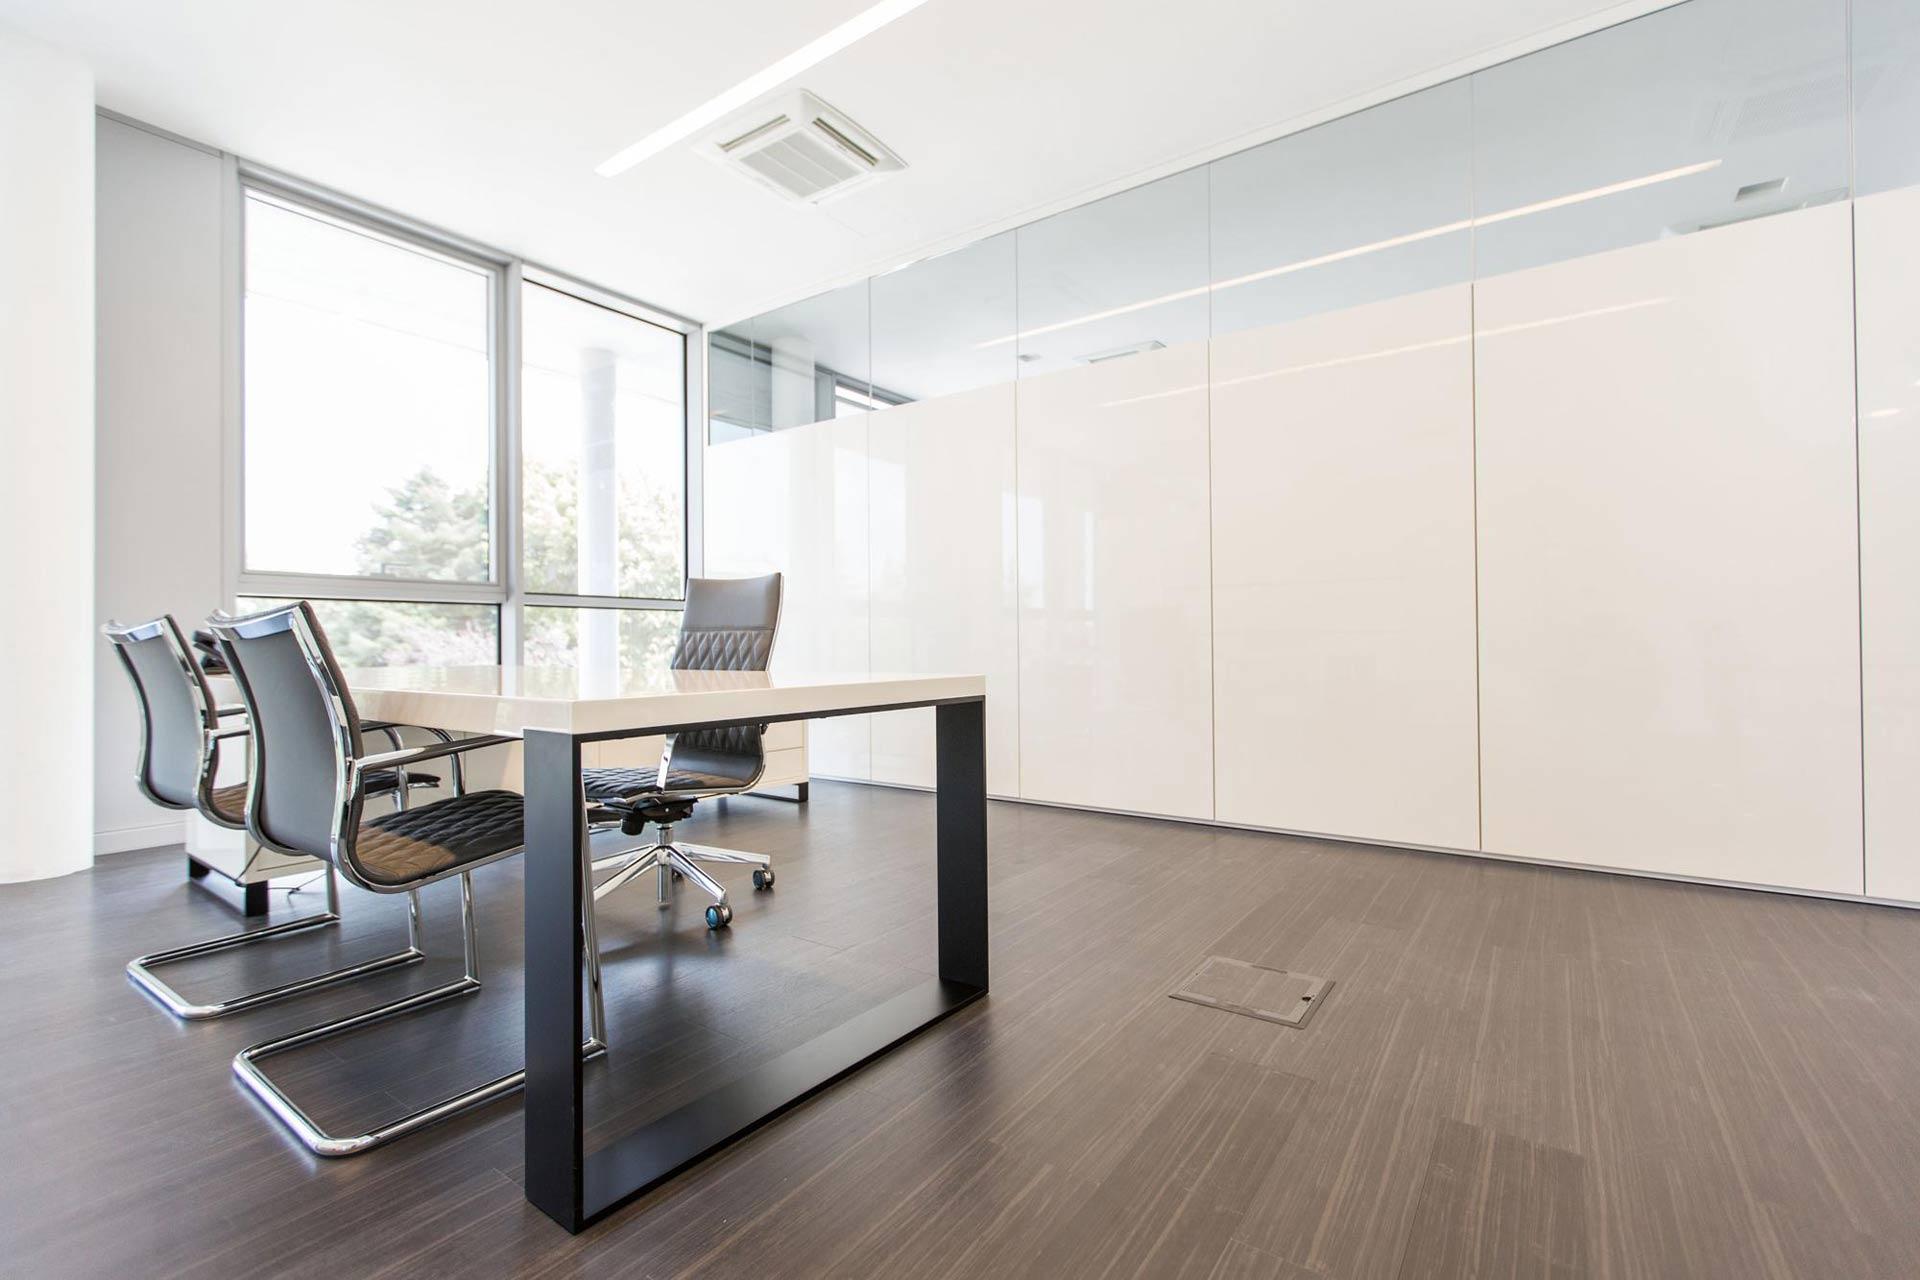 Bruno presezzi spa mobilier de bureau bureau ivm for Erreci arredamenti